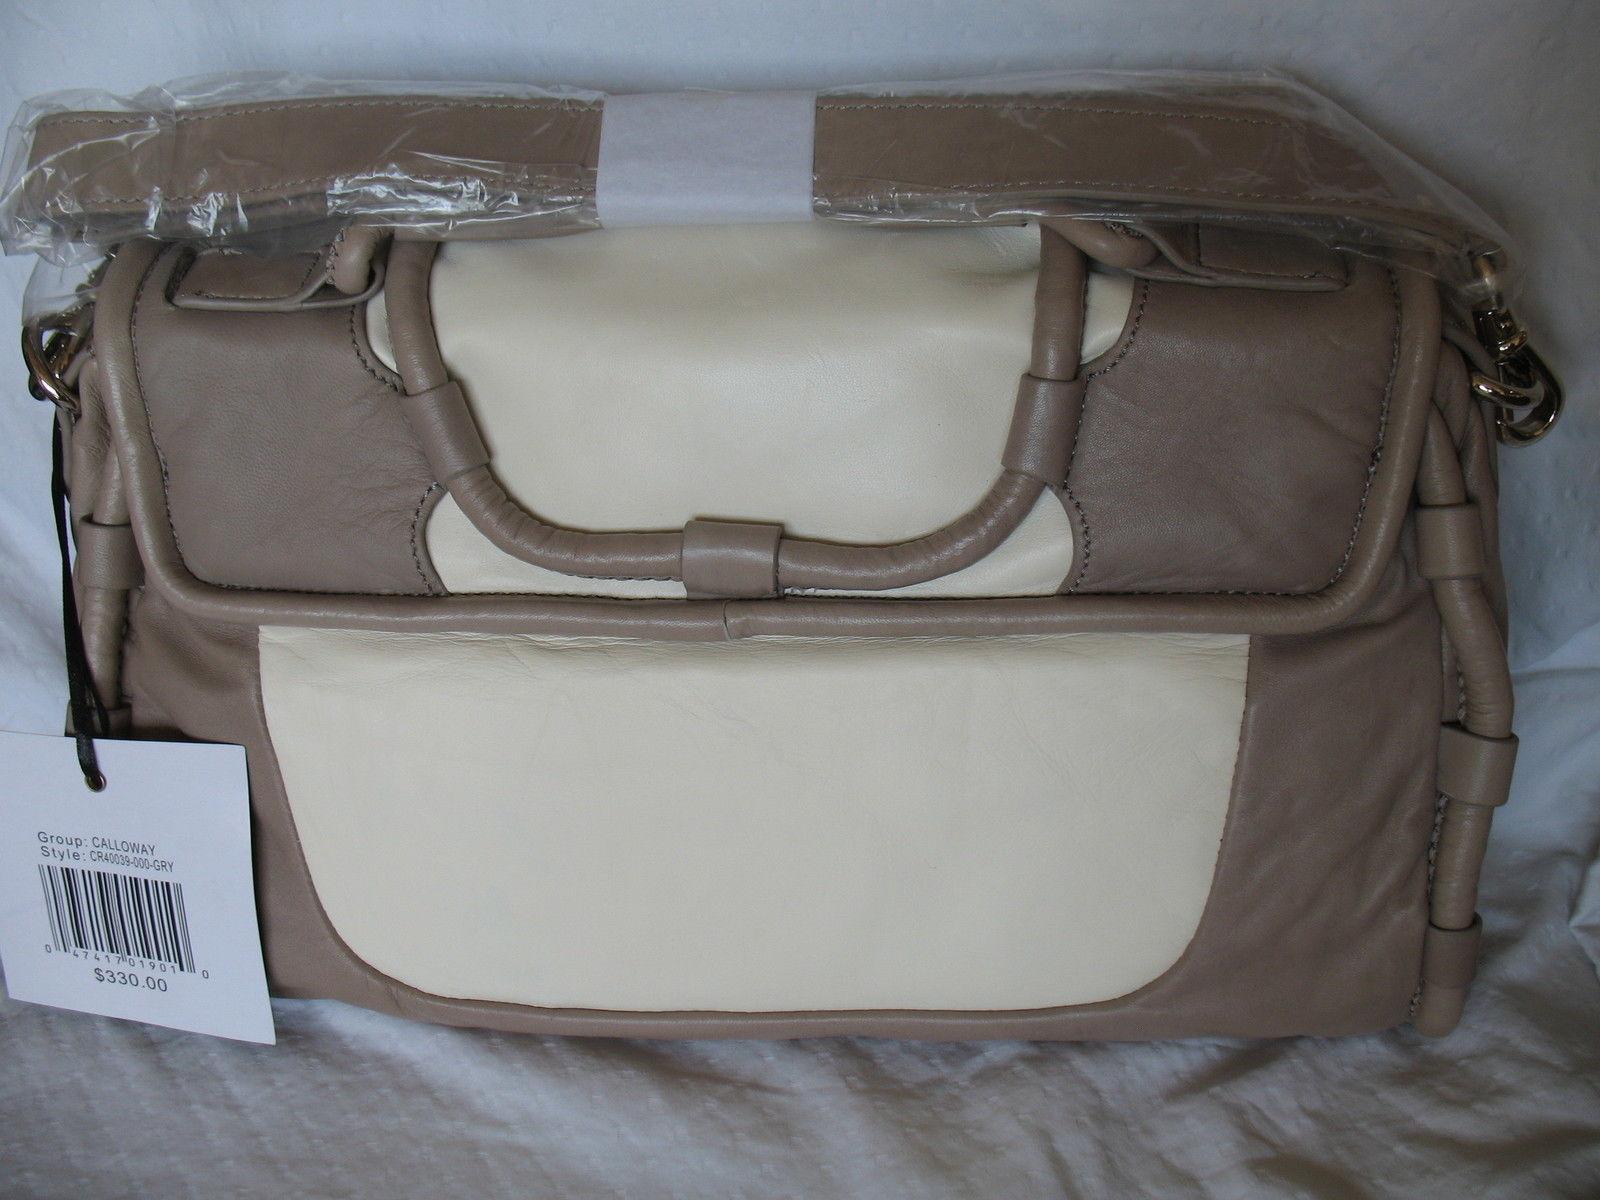 Cynthia Rowley Purse New Handbag Calloway Gray White Crossbody Leather Ash Color image 2